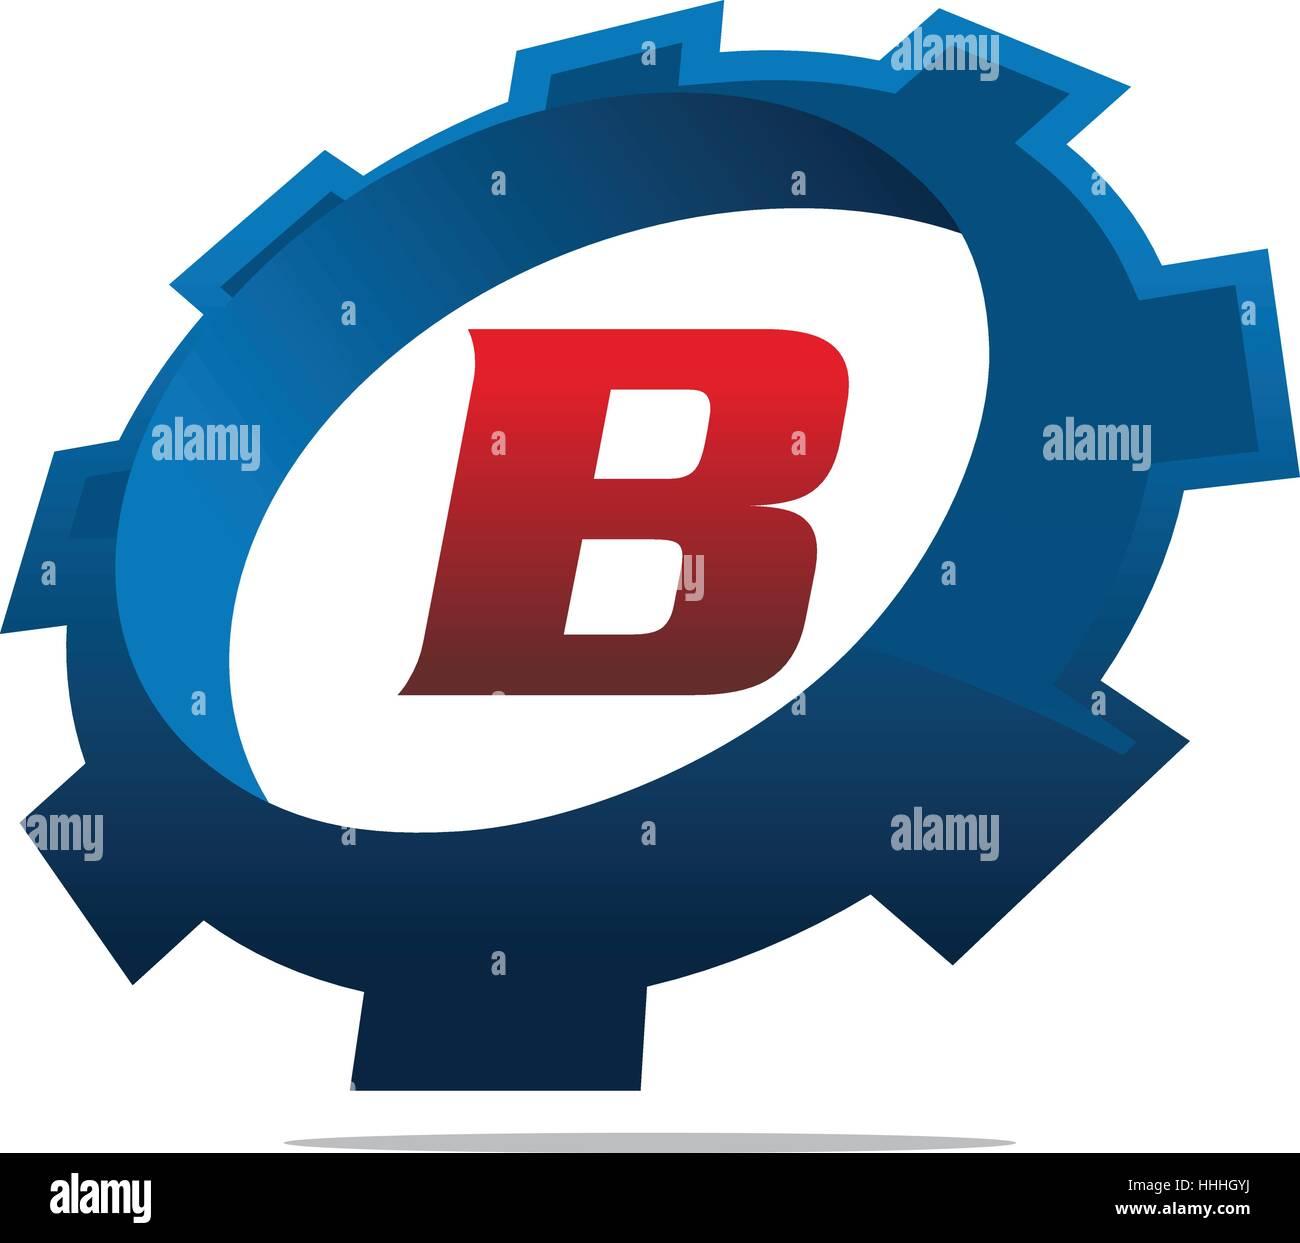 Tj initial luxury ornament monogram logo stock vector - Gear Logo Letter B Stock Image